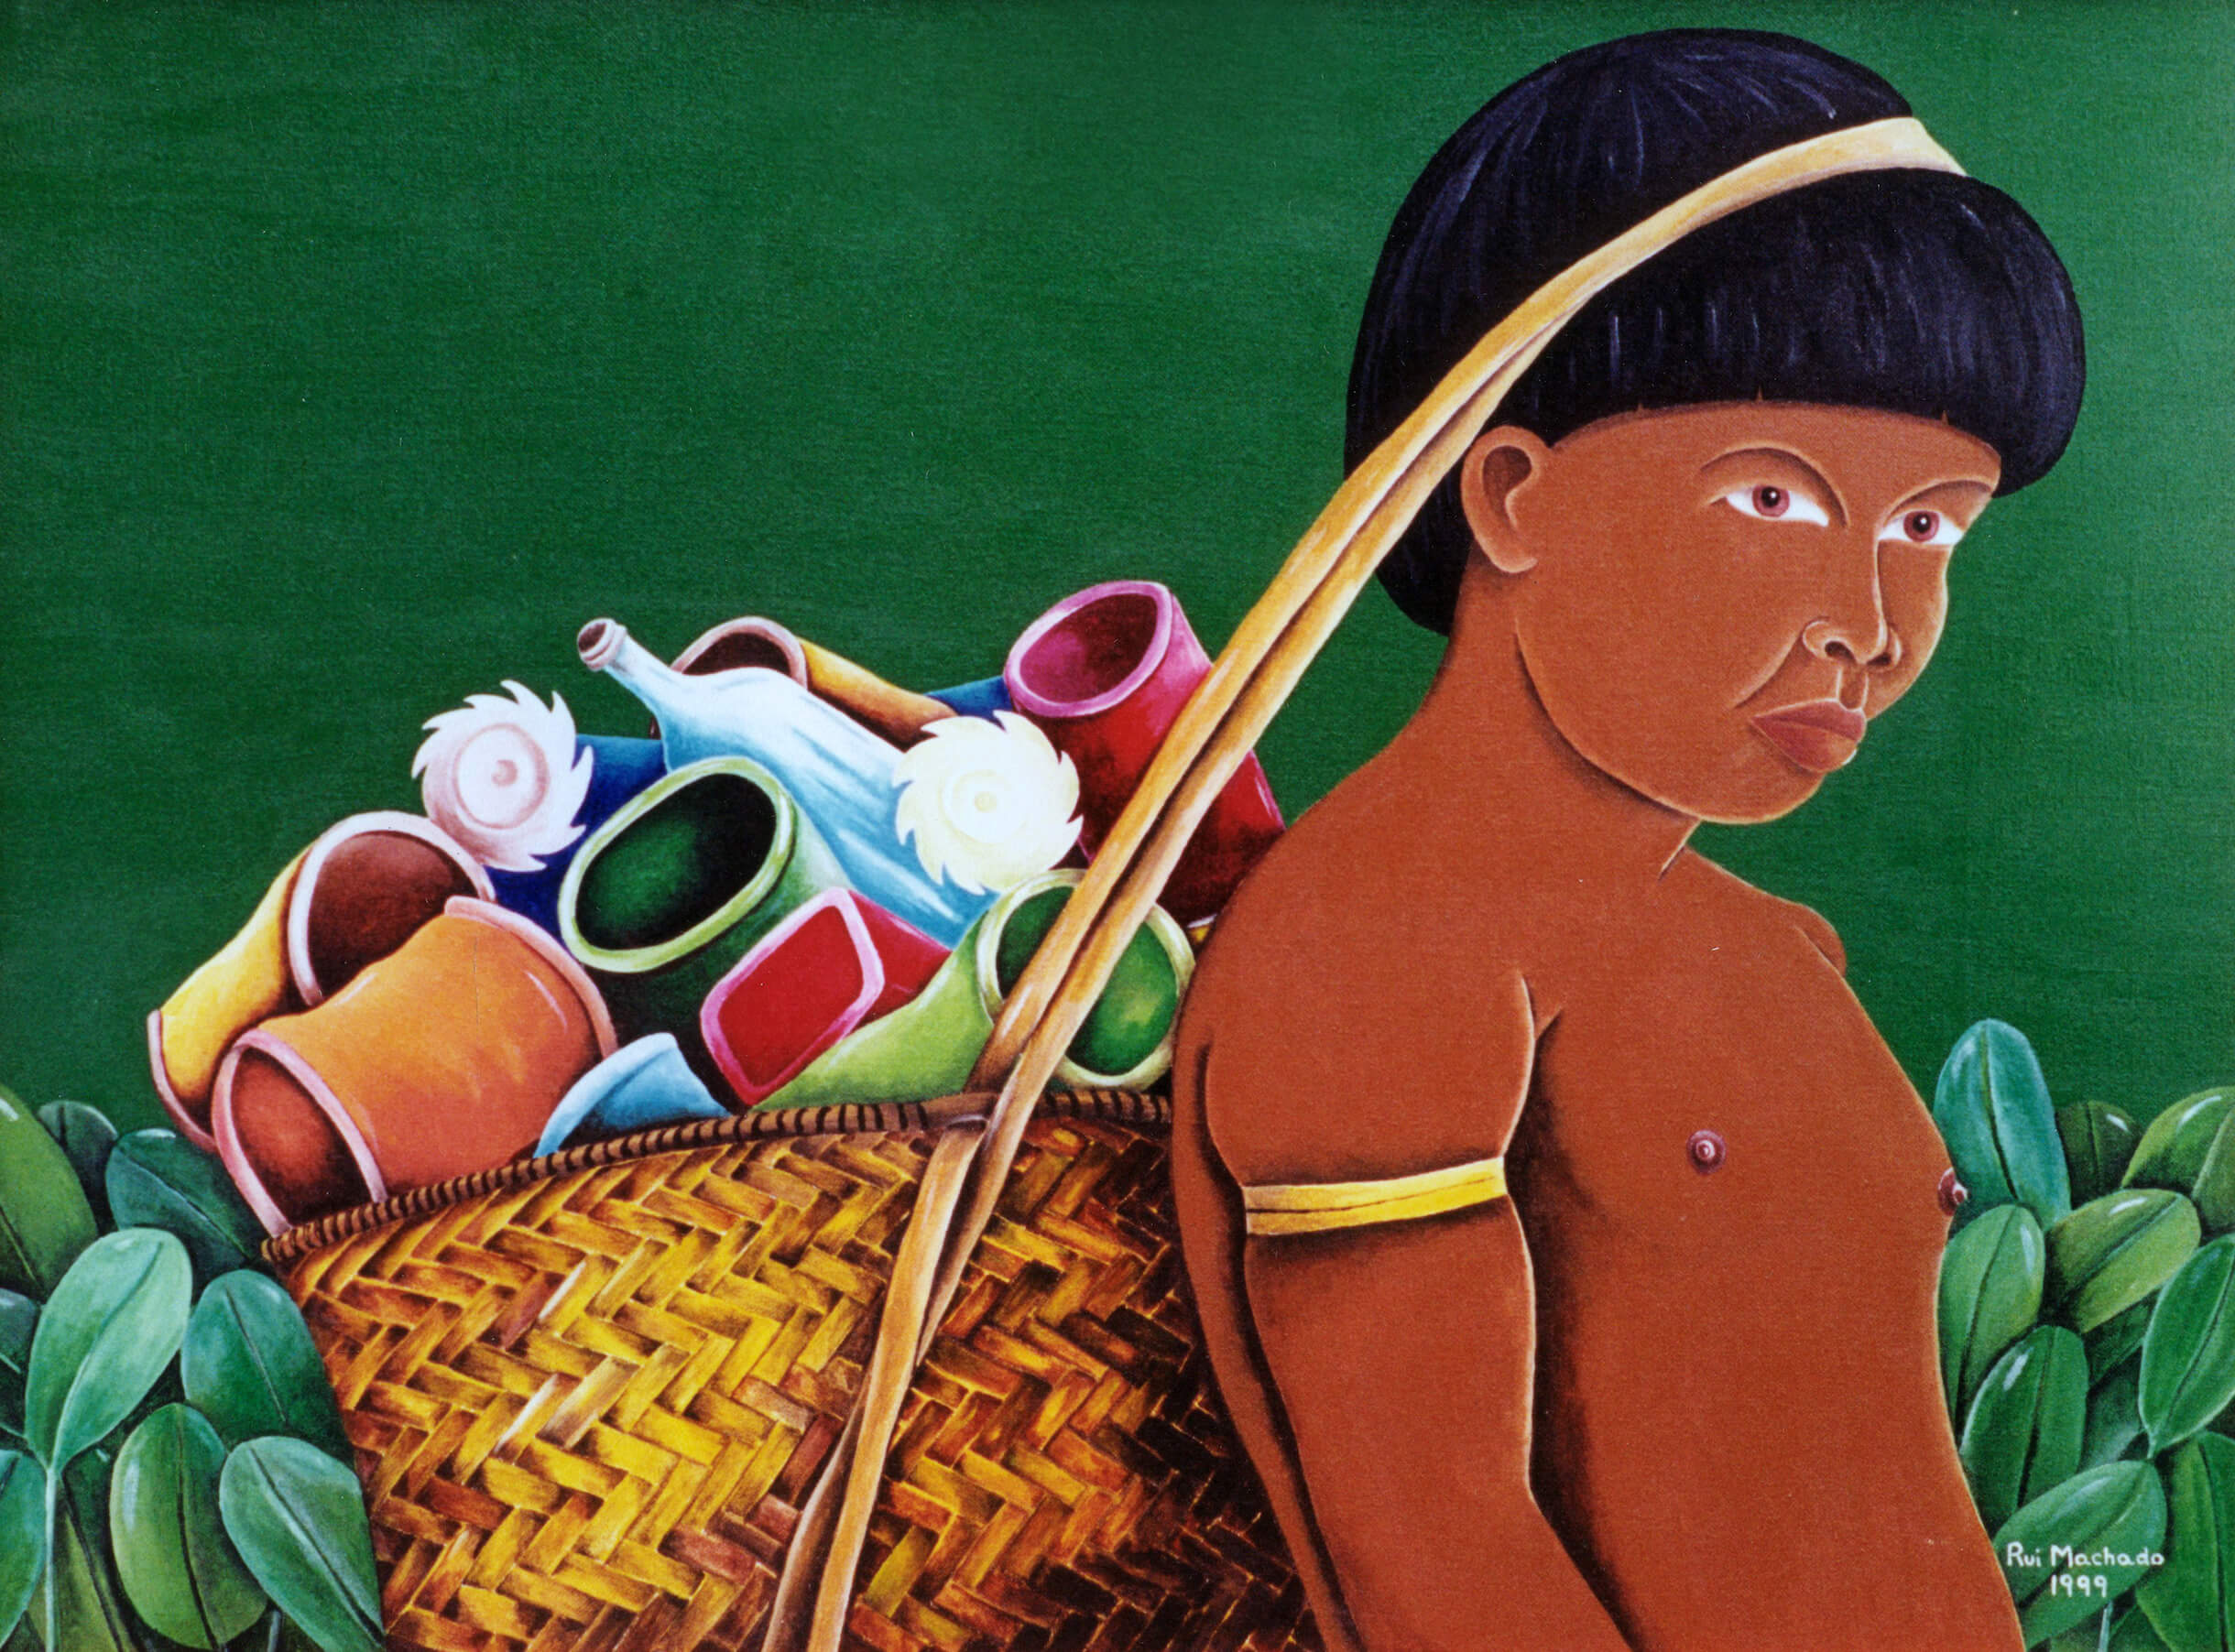 Série: Sobre vivência - Brasil 500 anos, (70 x 50 cm), acrílica sobre tela, 1999